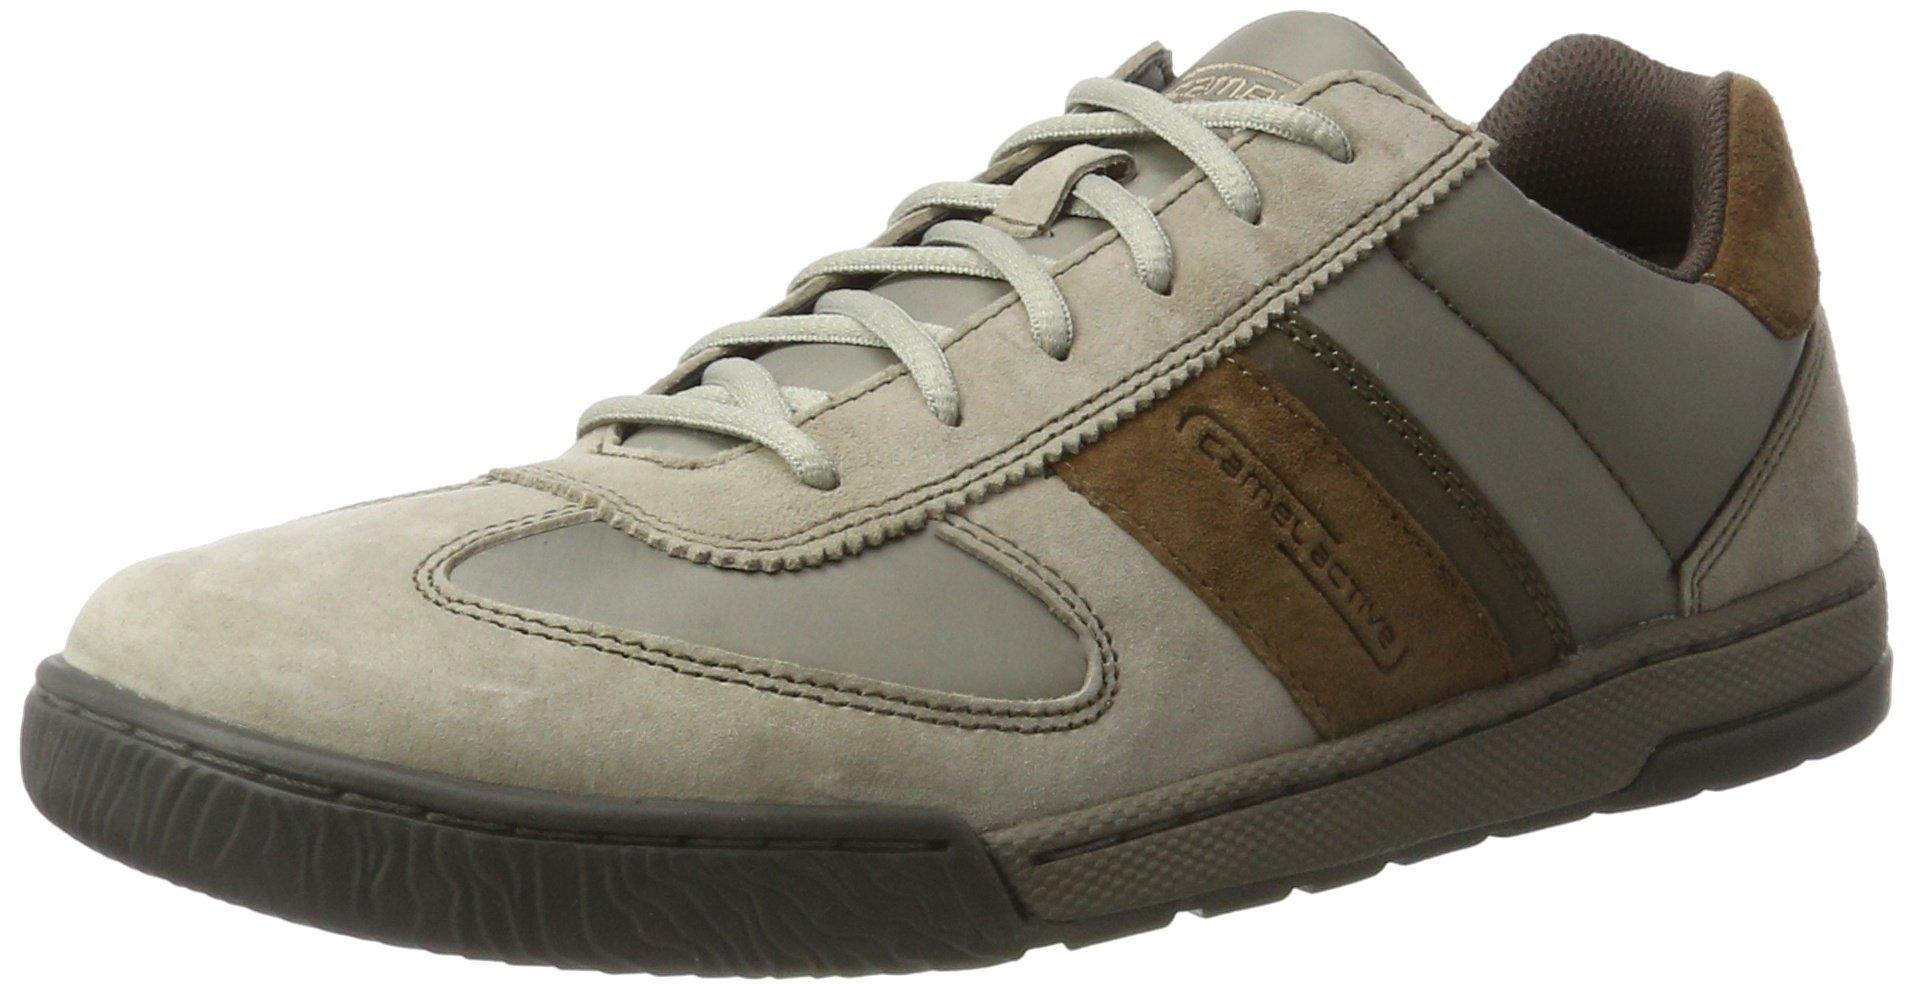 camel active Herren Casablanca 50 Sneakers, Grau (01 Grey Kombi), 44 EU